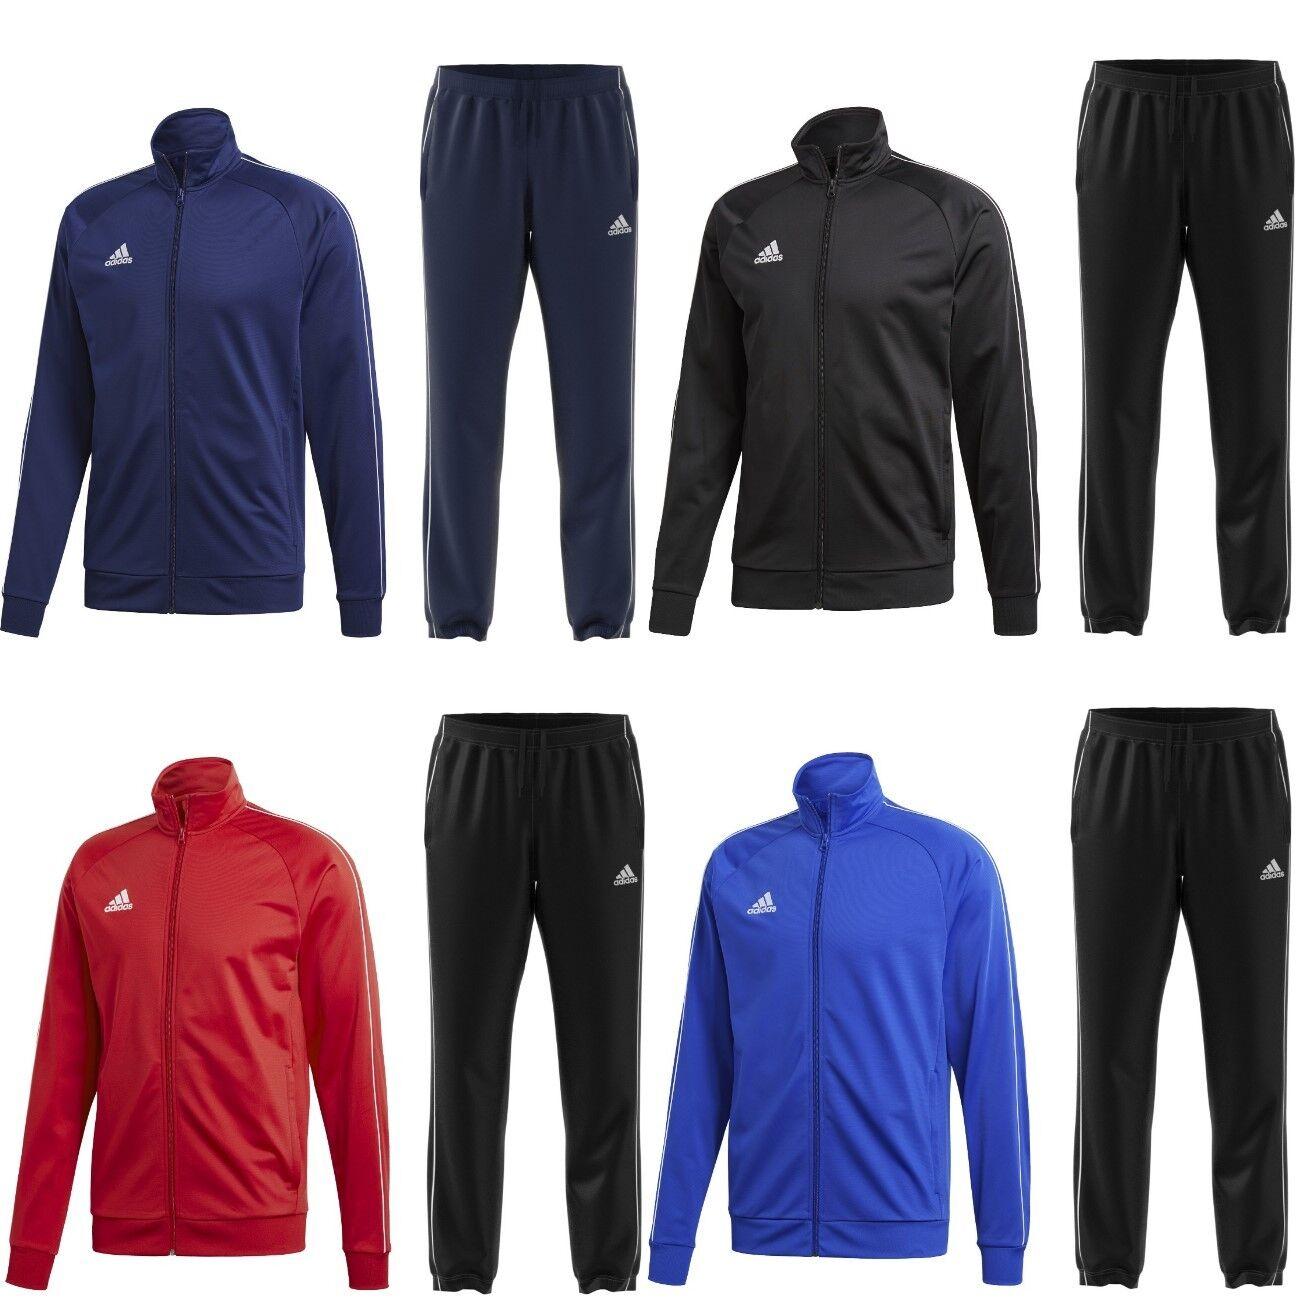 adidas Herren Trainingsanzug Sportanzug Jogginganzug schwarz blau rot Männer